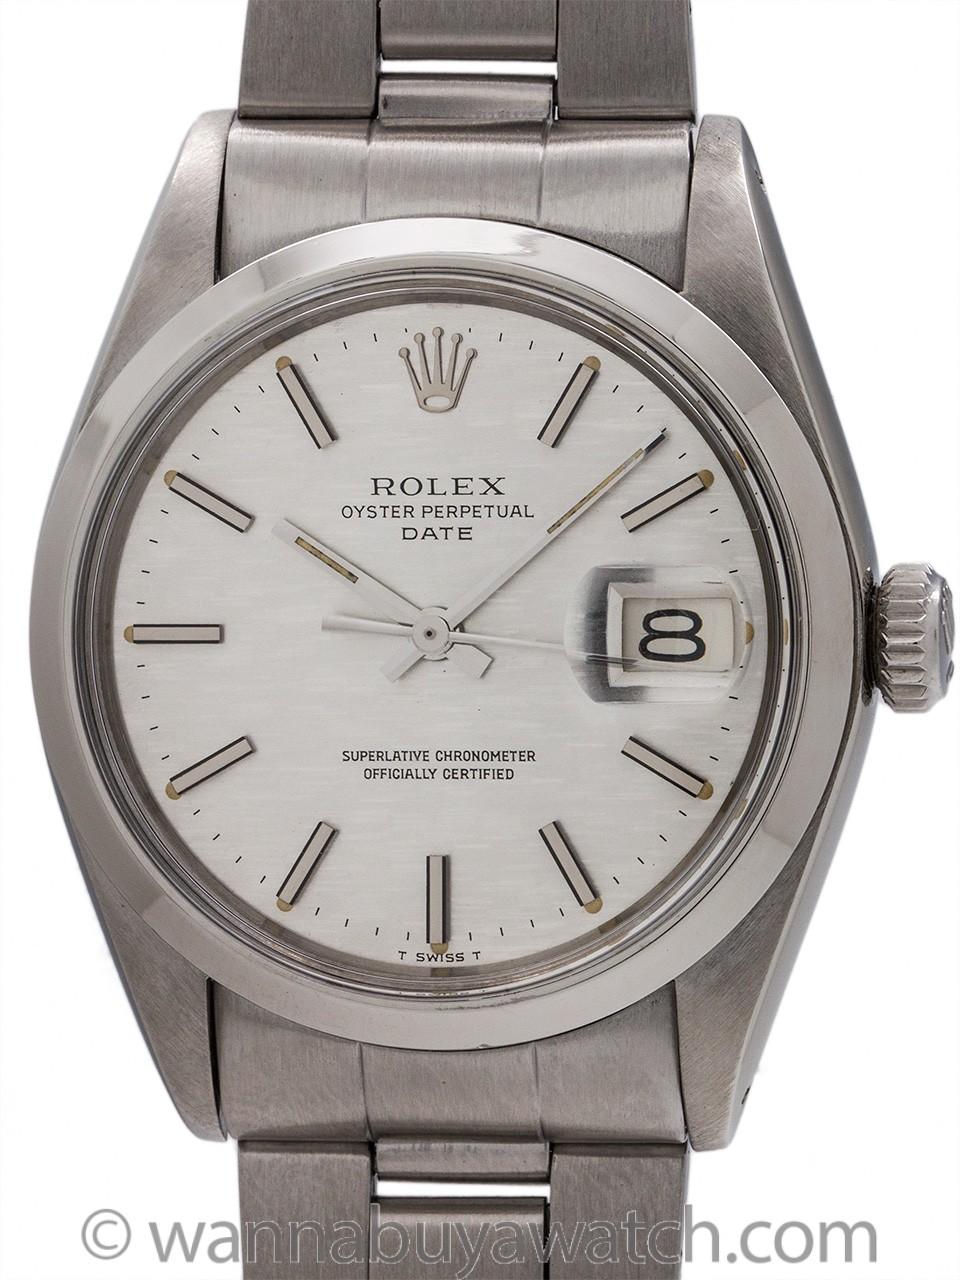 Rolex Oyster Perpetual Date ref 1500 Linen Dial circa 1972